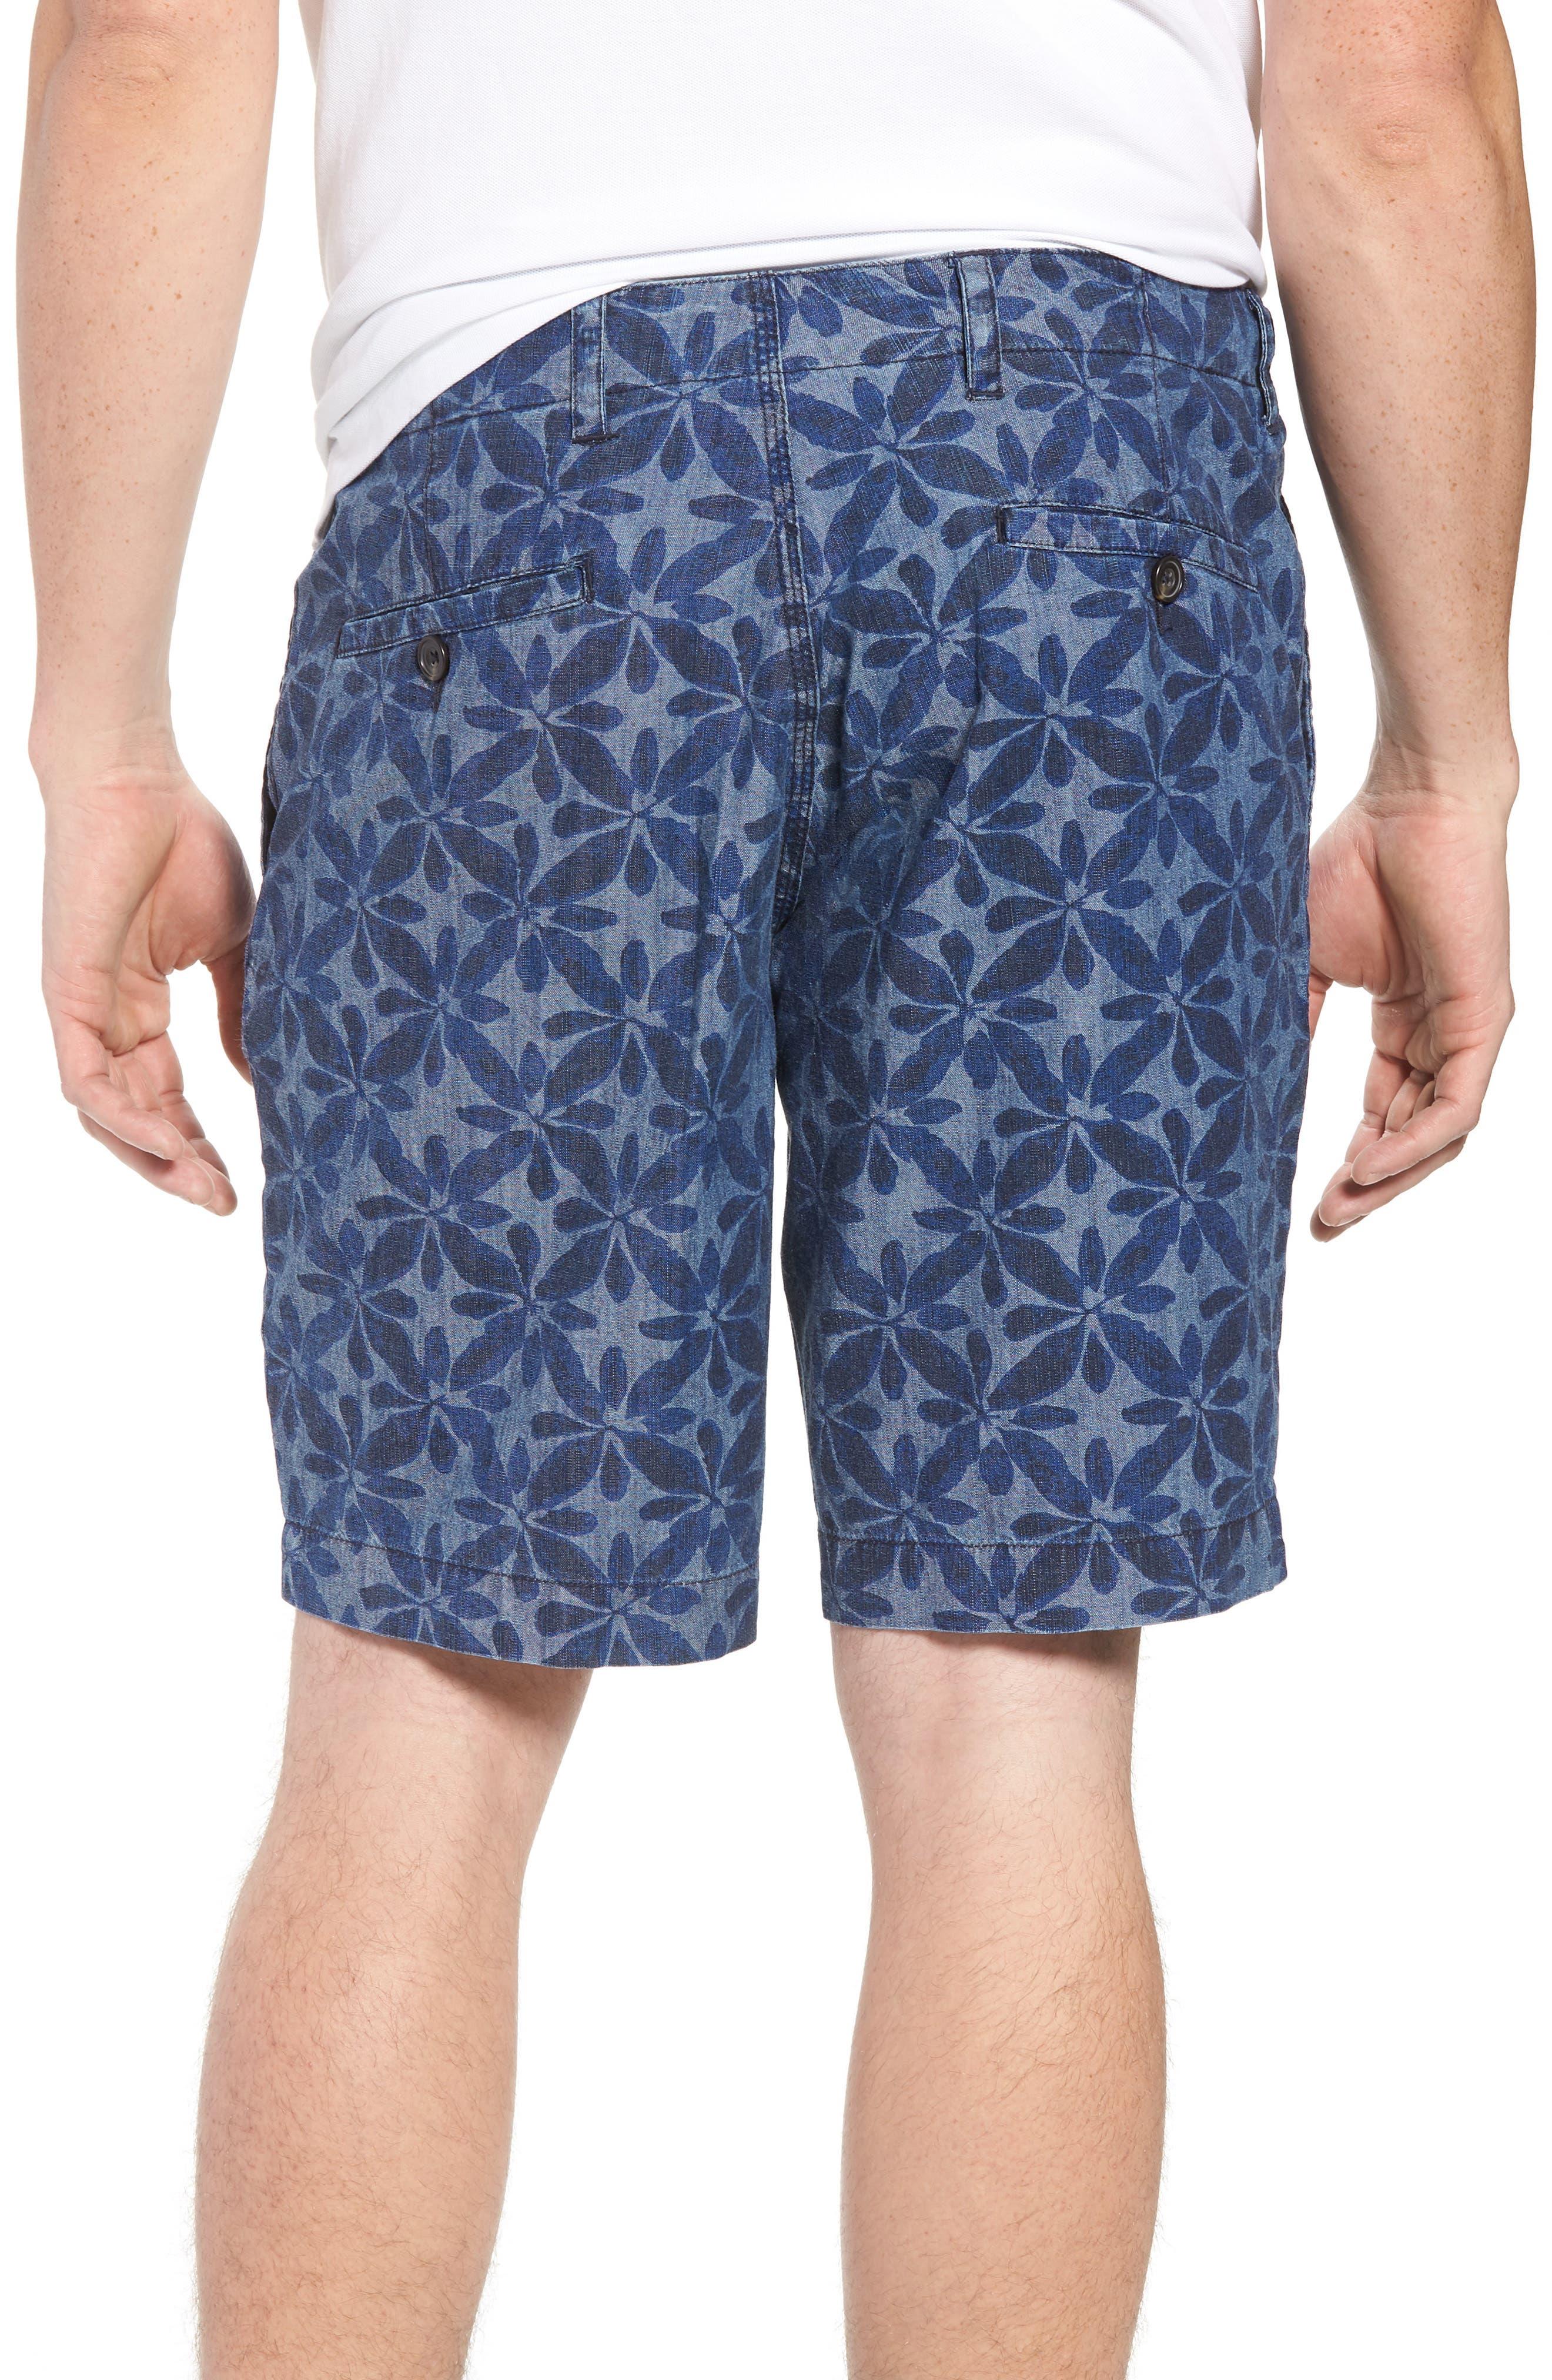 Franju Floral Cotton Shorts,                             Alternate thumbnail 2, color,                             Rinse And Softener